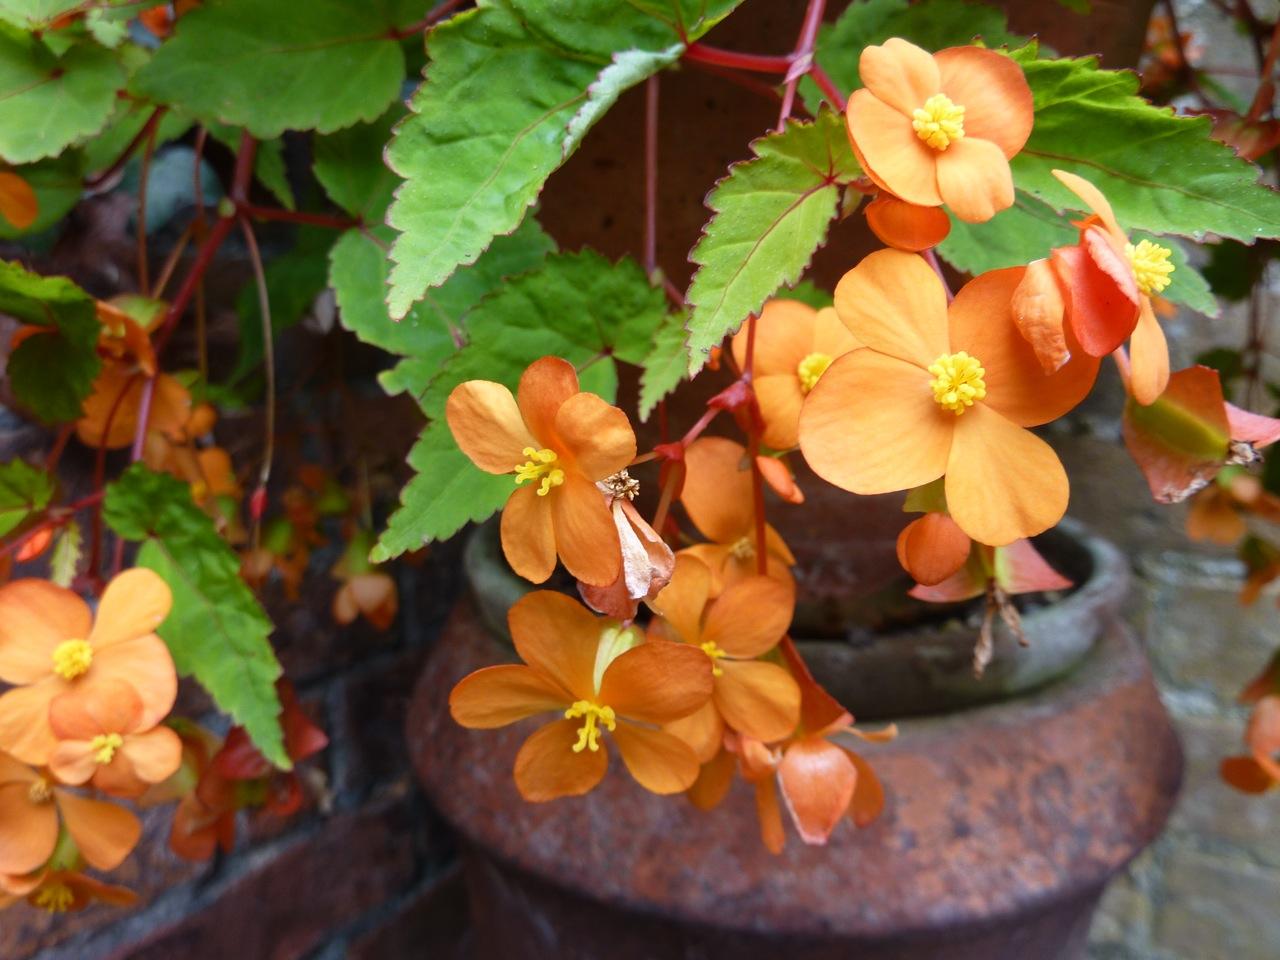 close-up of Begonia sutherlandii flowers